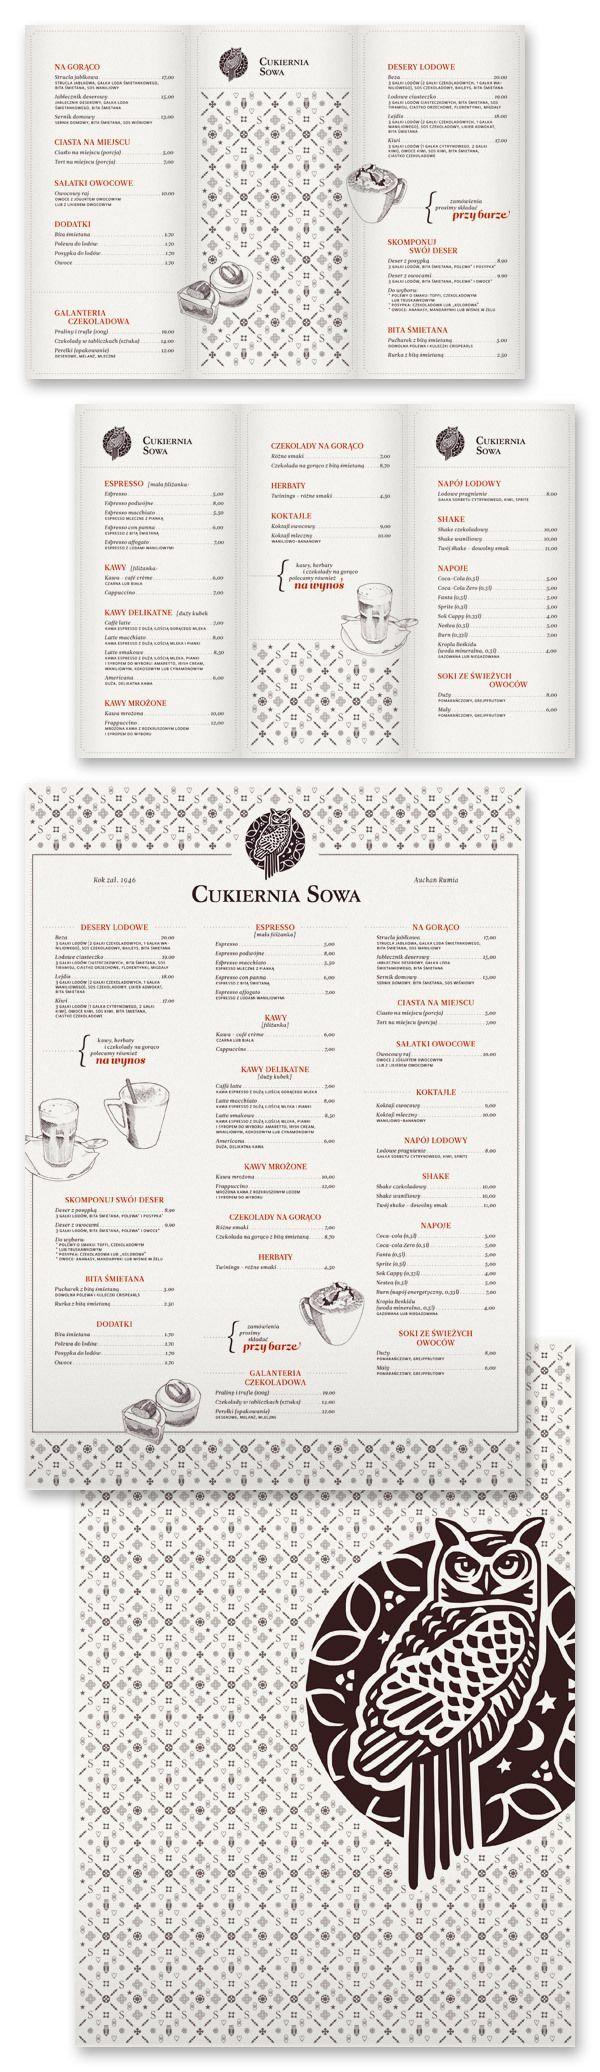 menu design owl creative black and white